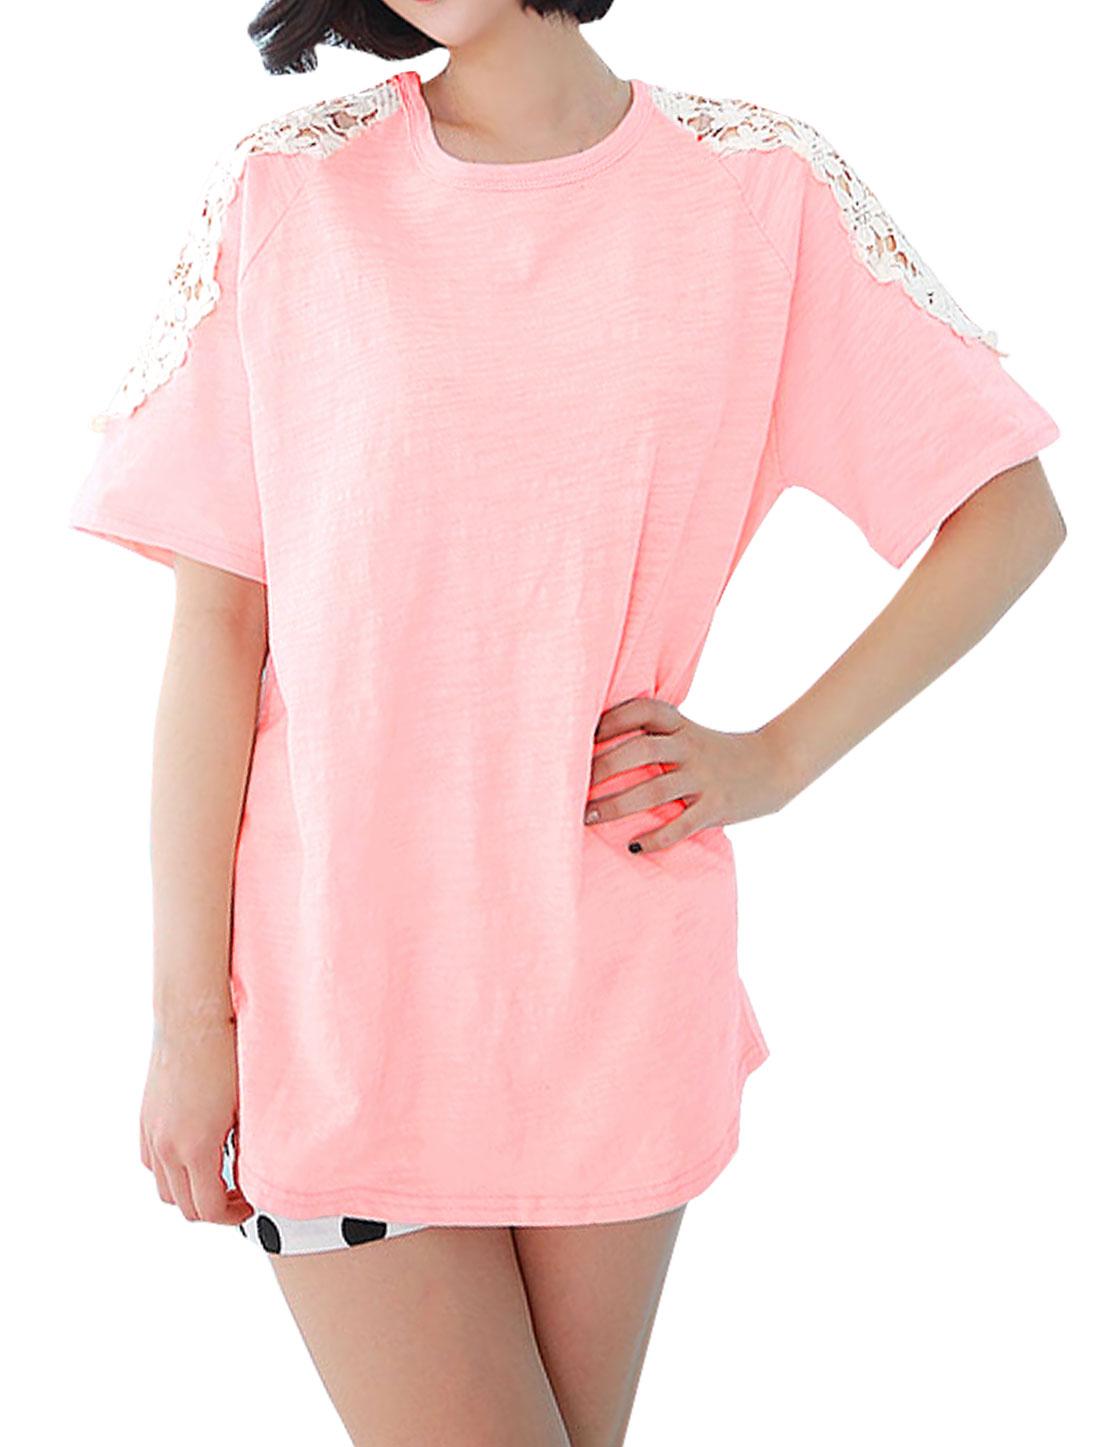 Woman Raglan Crochet Hollow Out Design Tunic T-Shirt Pink XS